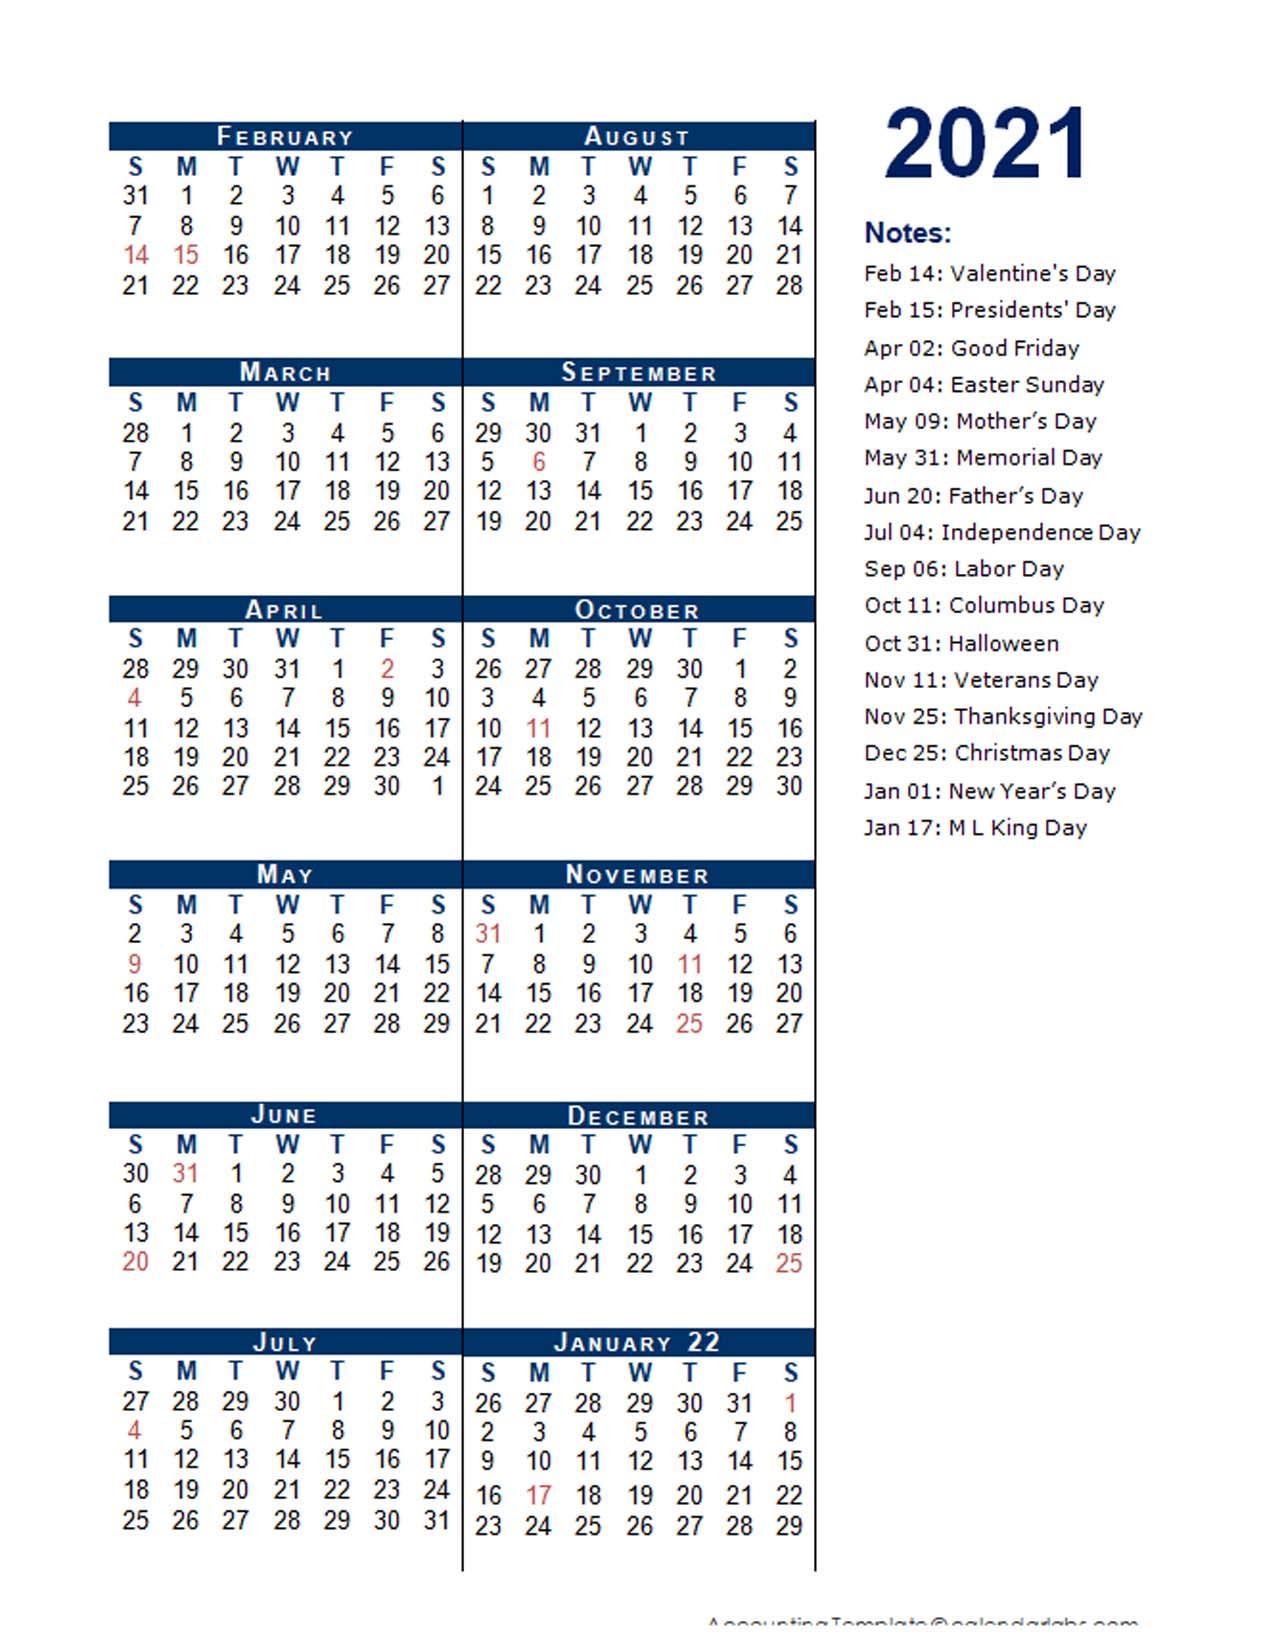 2021 Fiscal Period Calendar 4-4-5 - Free Printable Templates